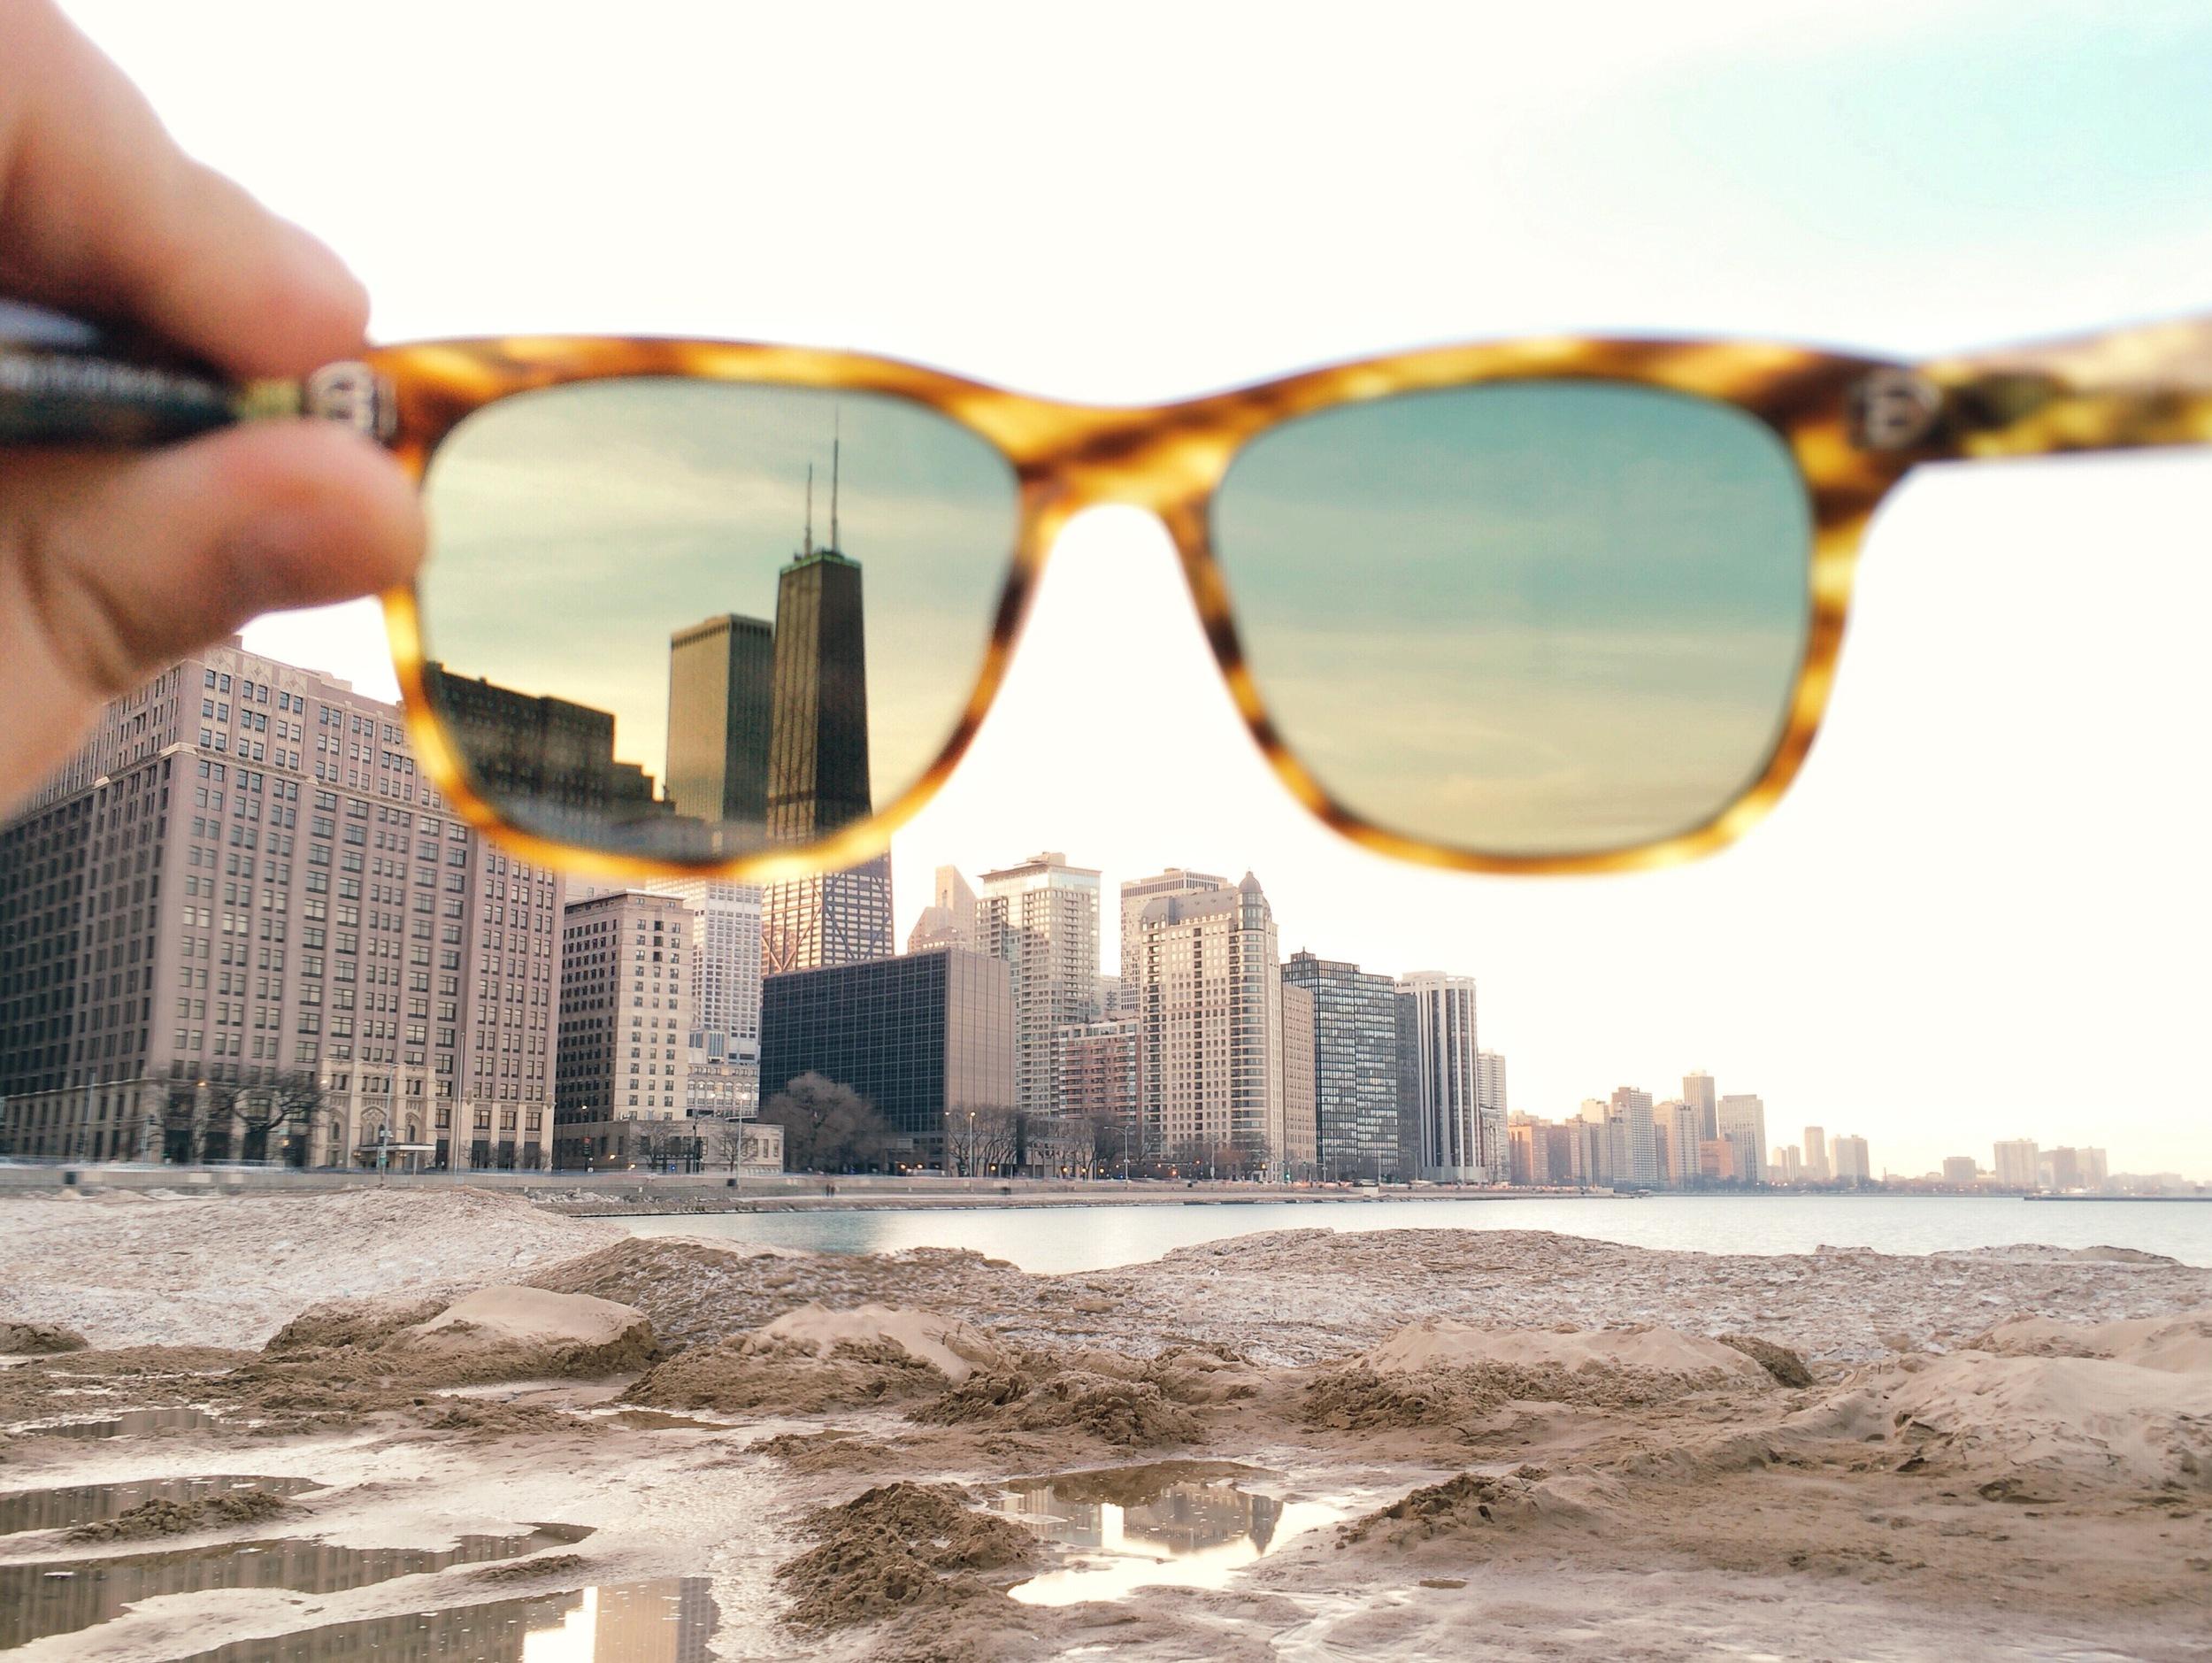 Milton Olive Park through Sunglasses.jpg